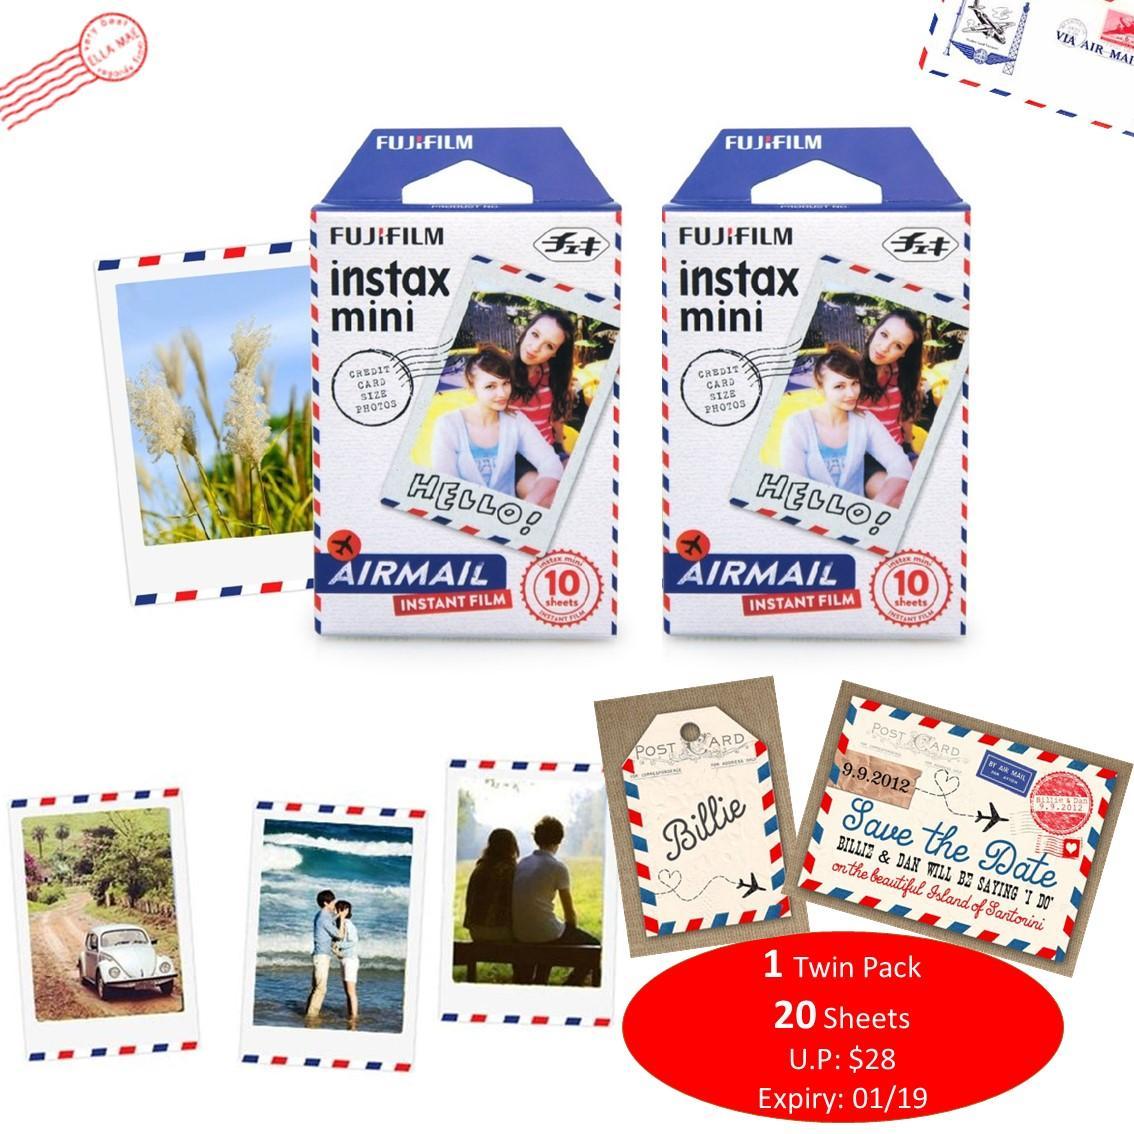 Fujifilm Instax Mini Film Airmail Twin Pack Expiry 01/19 onwards